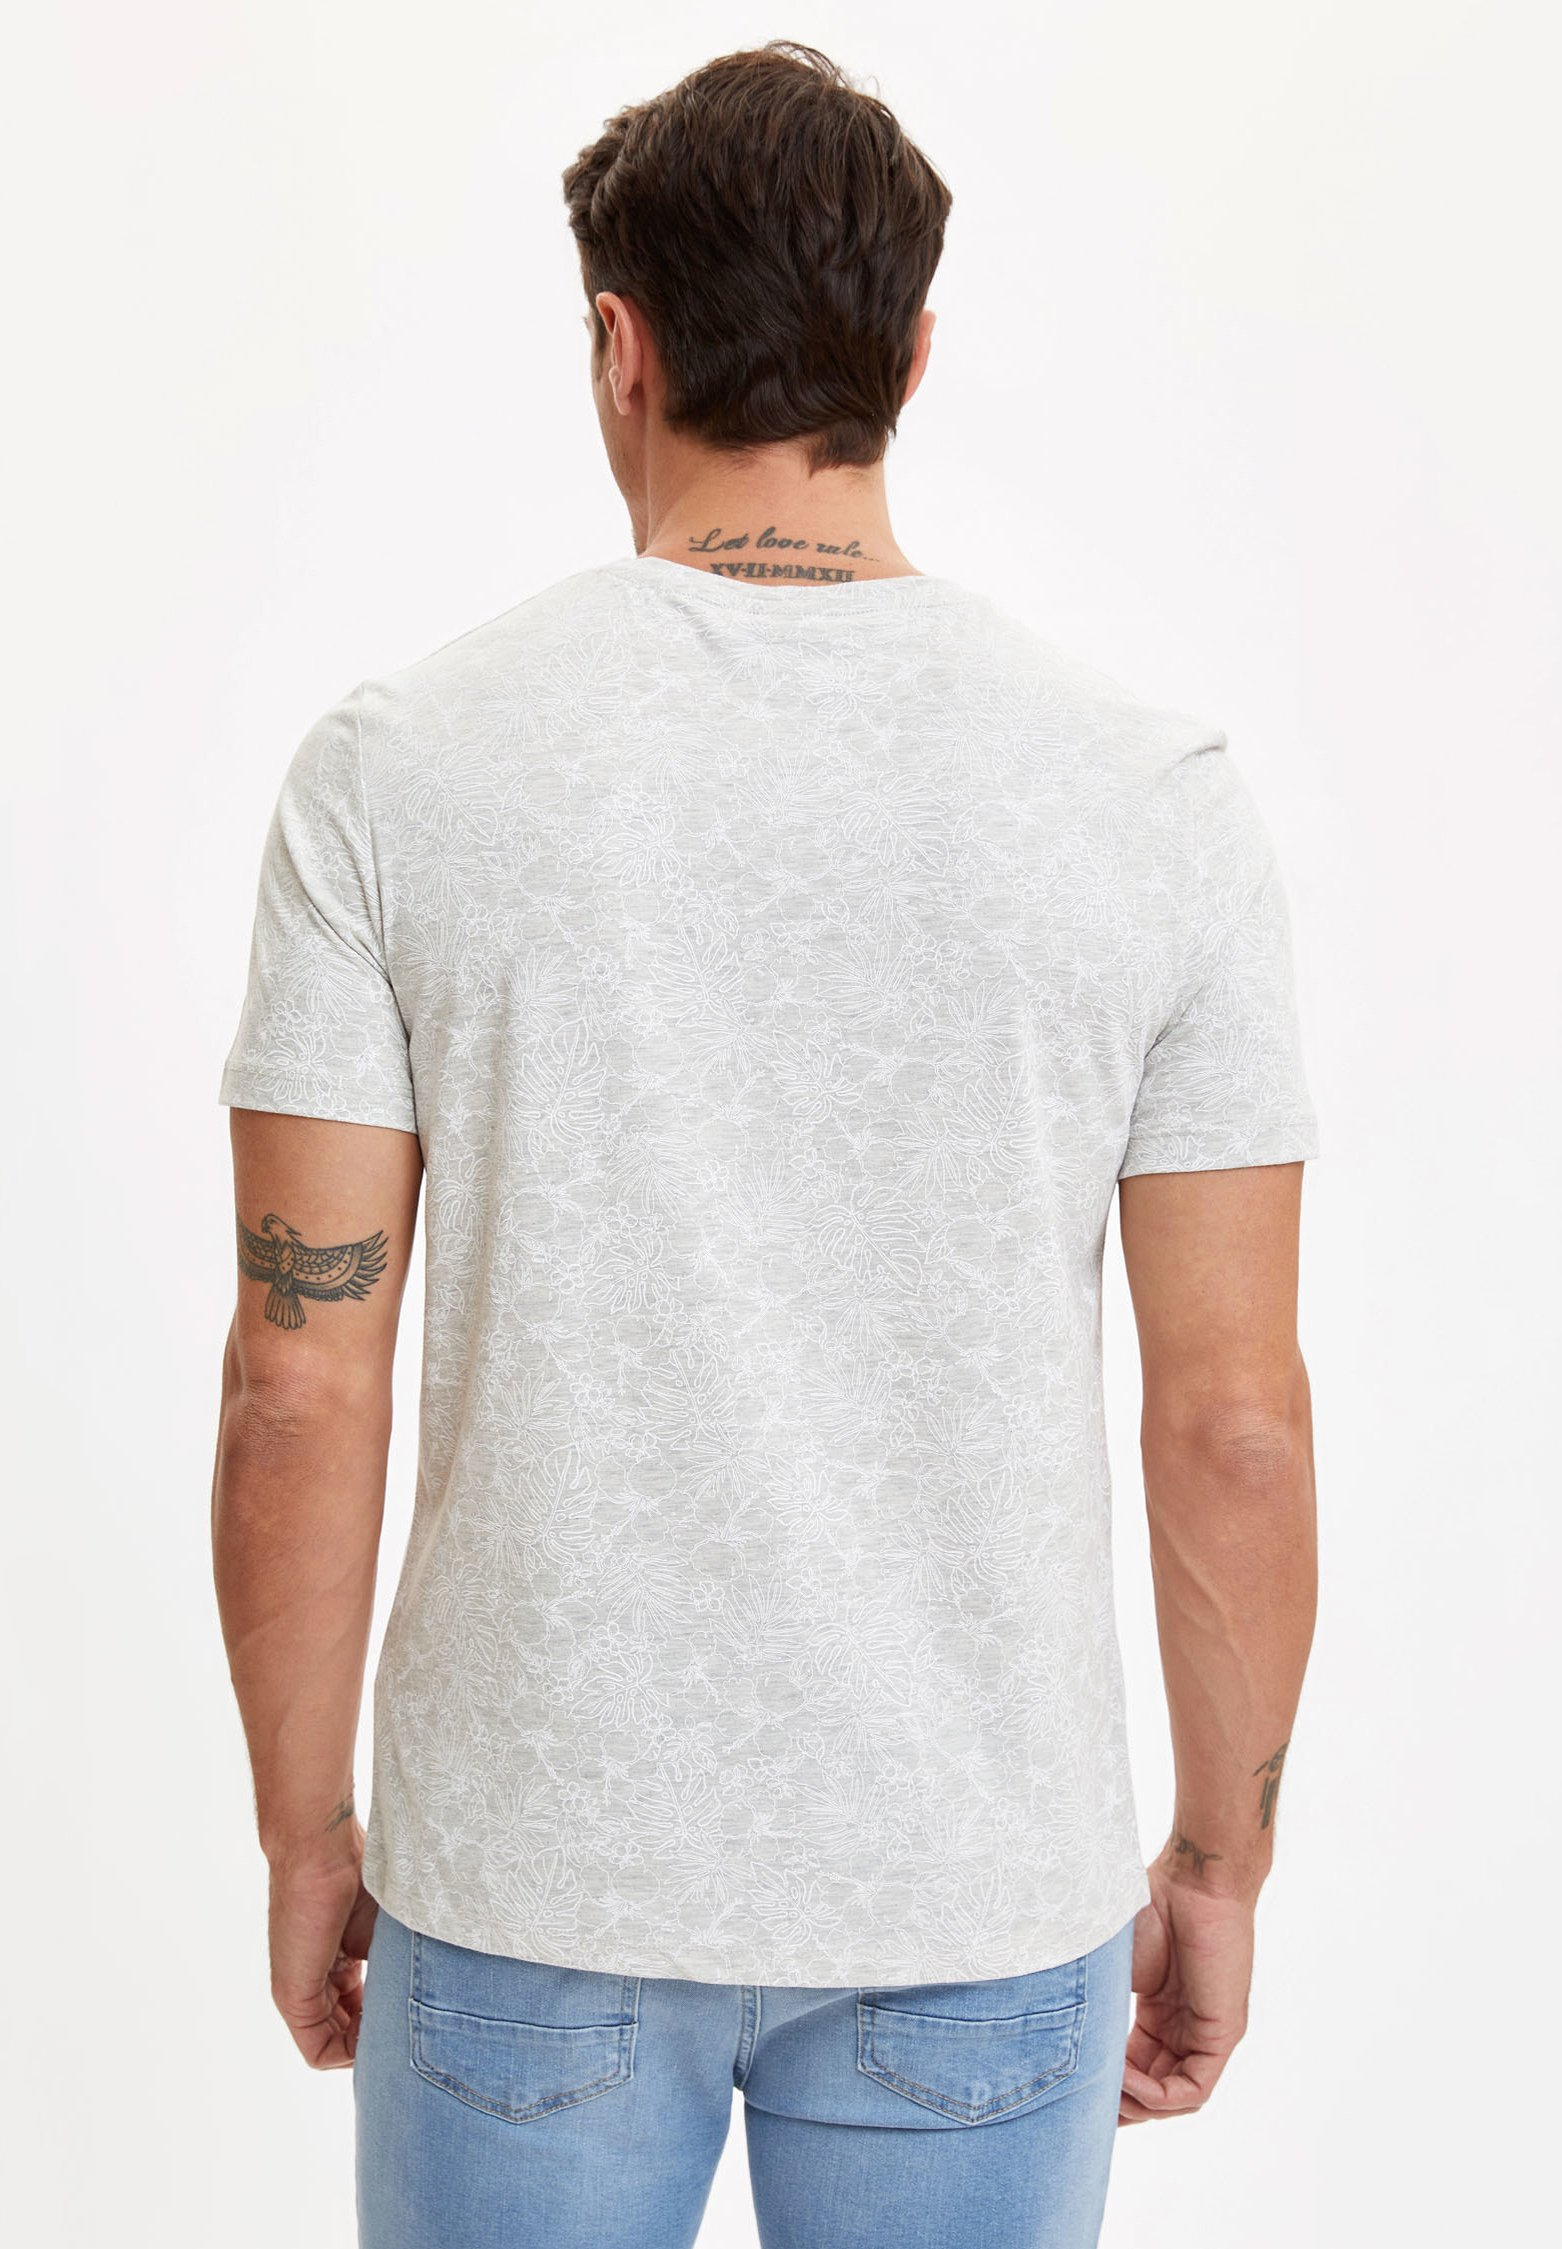 DeFacto Basic T-shirt - beige fg8Mv